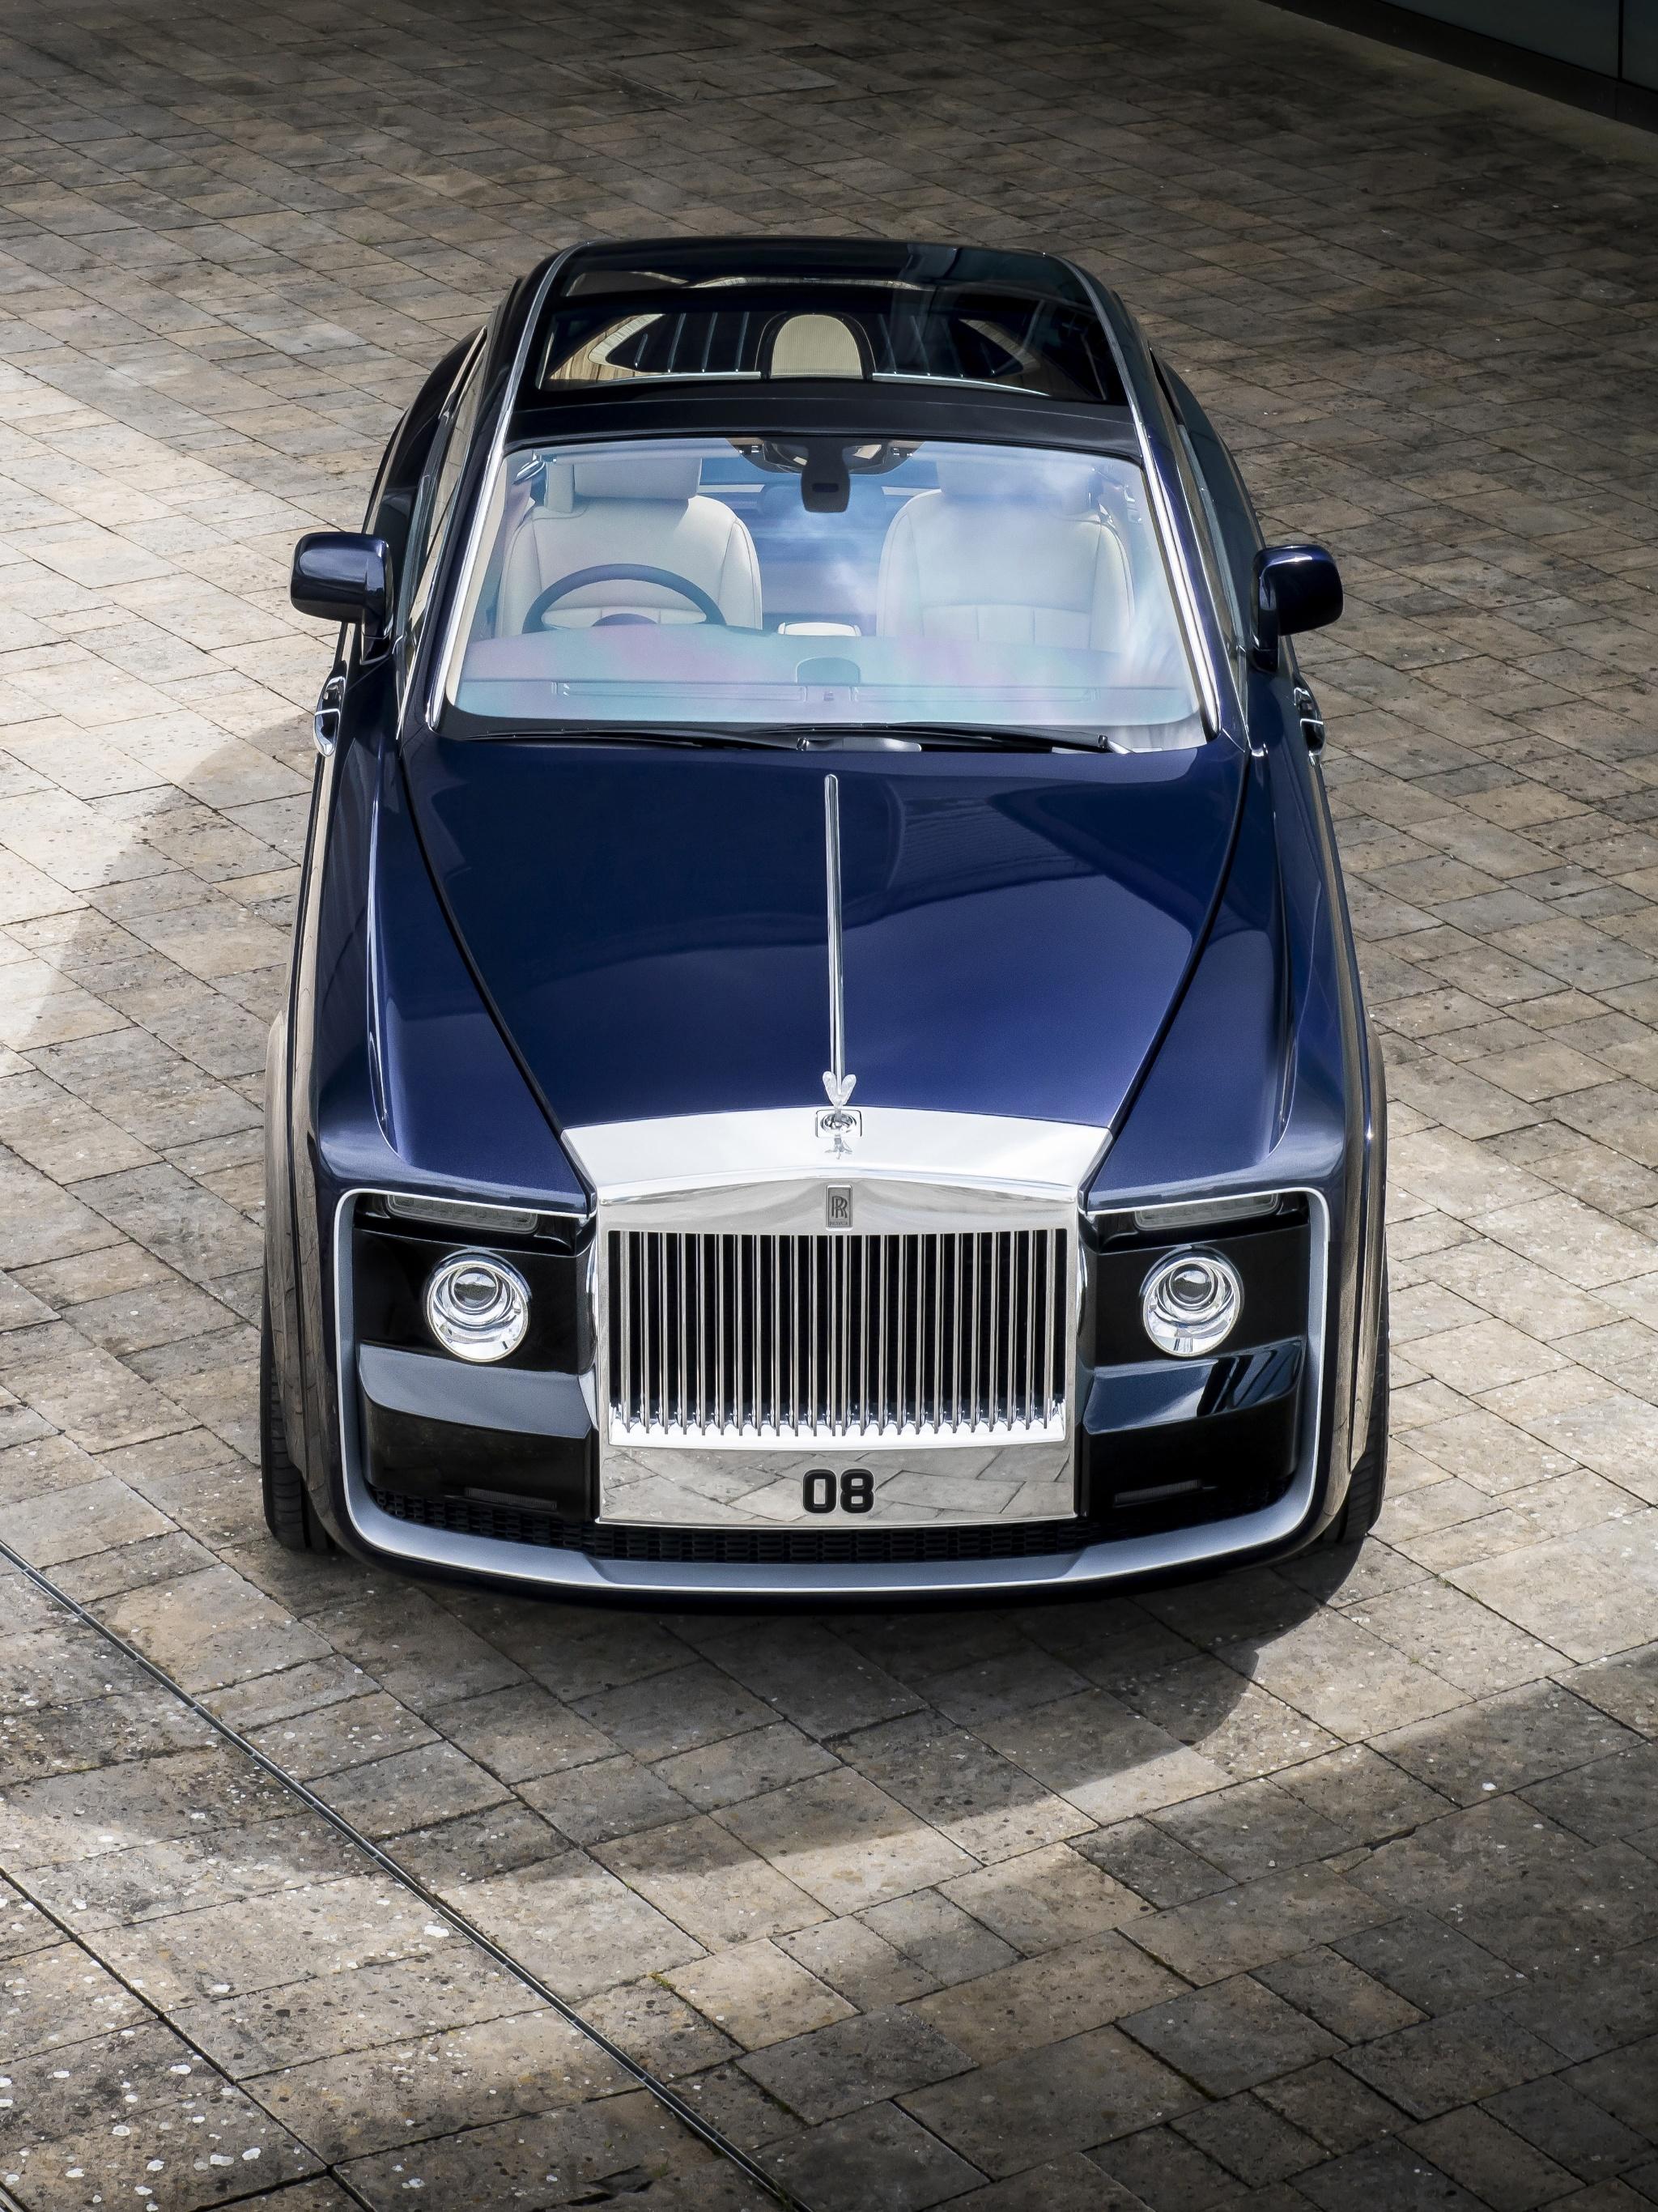 Фото Rolls-Royce 2017 Sweptail Синий Сверху Металлик Автомобили 2048x2732 Роллс ройс Авто Машины